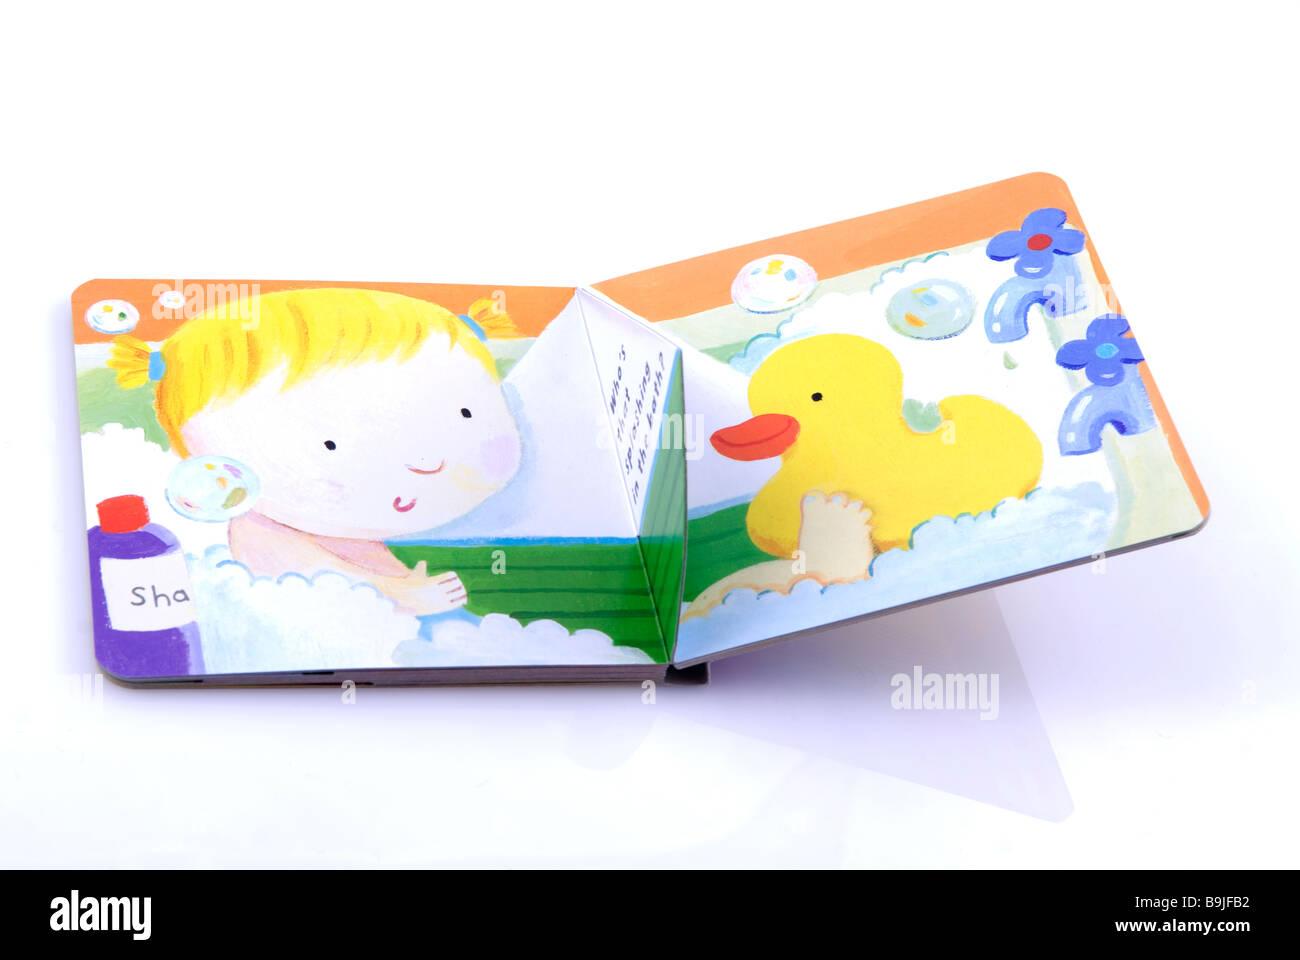 Pop Up Books Imágenes De Stock & Pop Up Books Fotos De Stock - Alamy